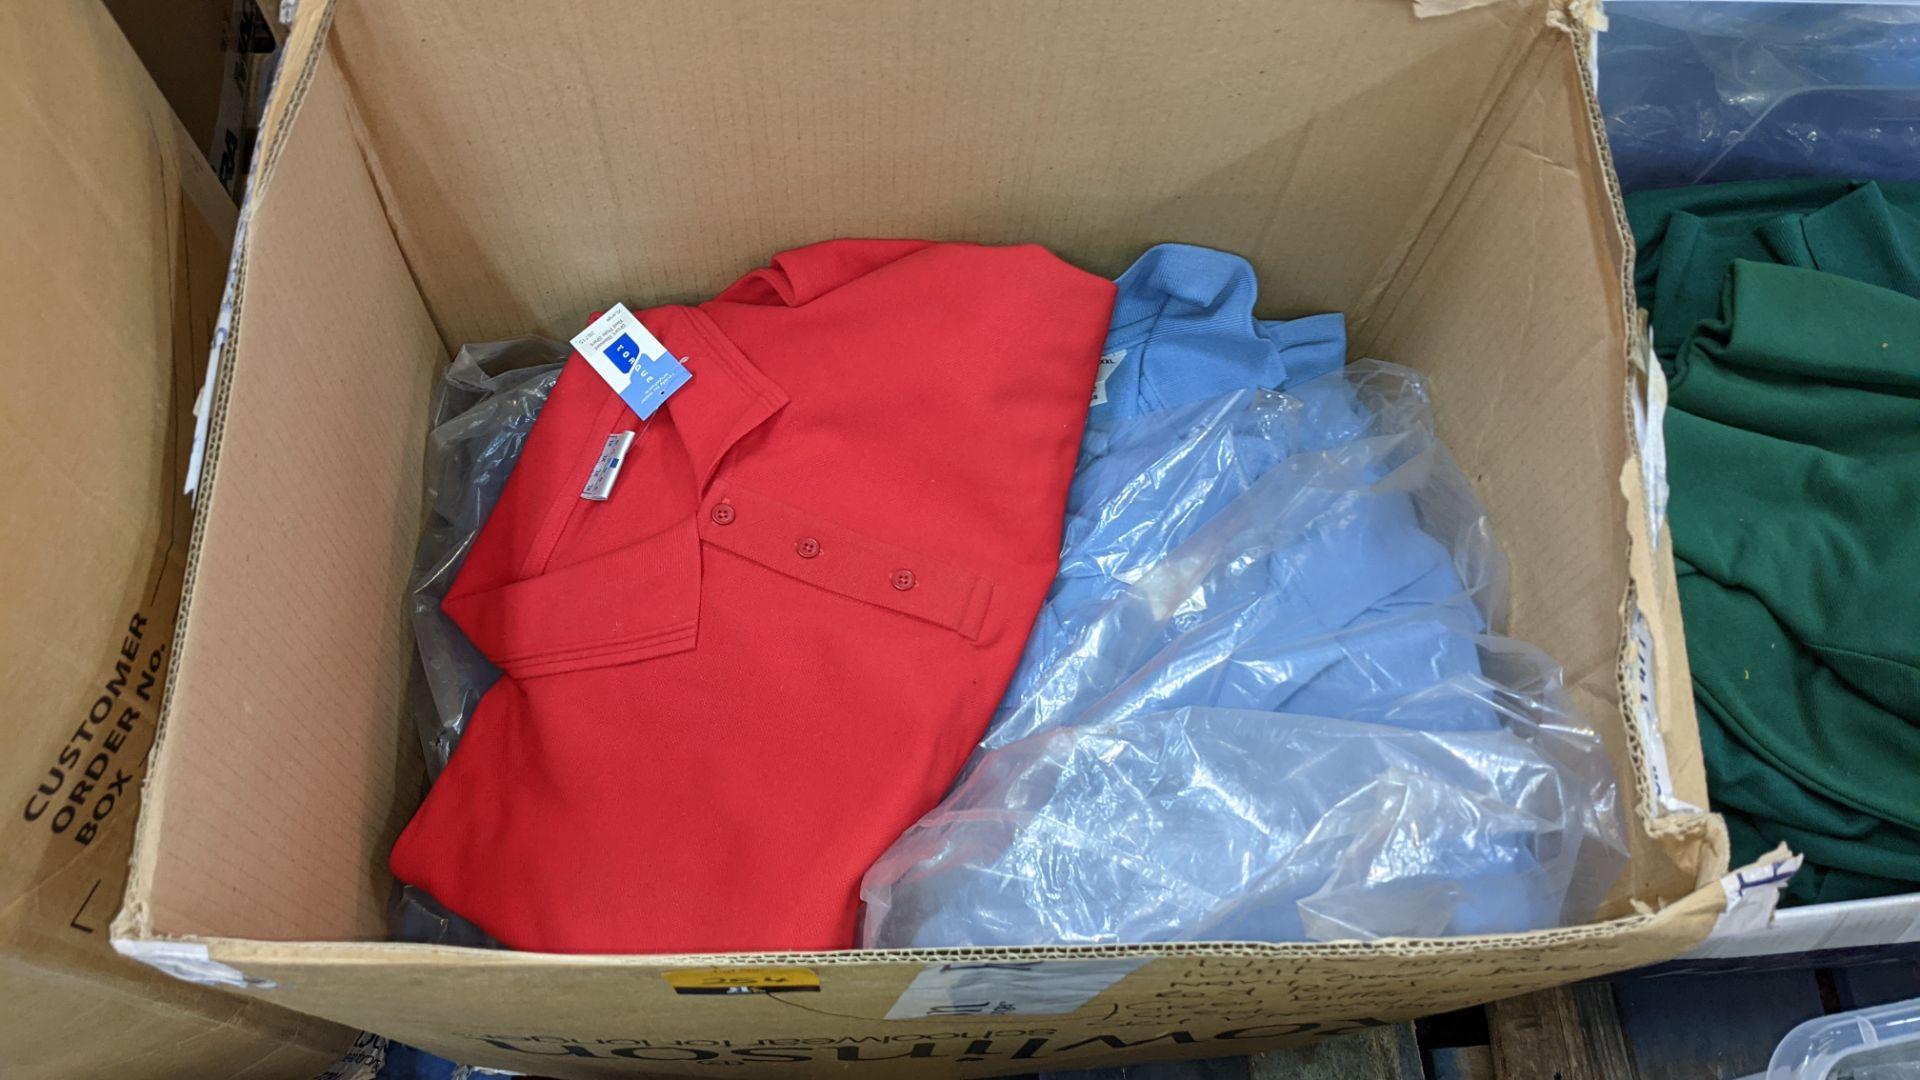 20 assorted polo shirts - 1 large box - Image 2 of 5